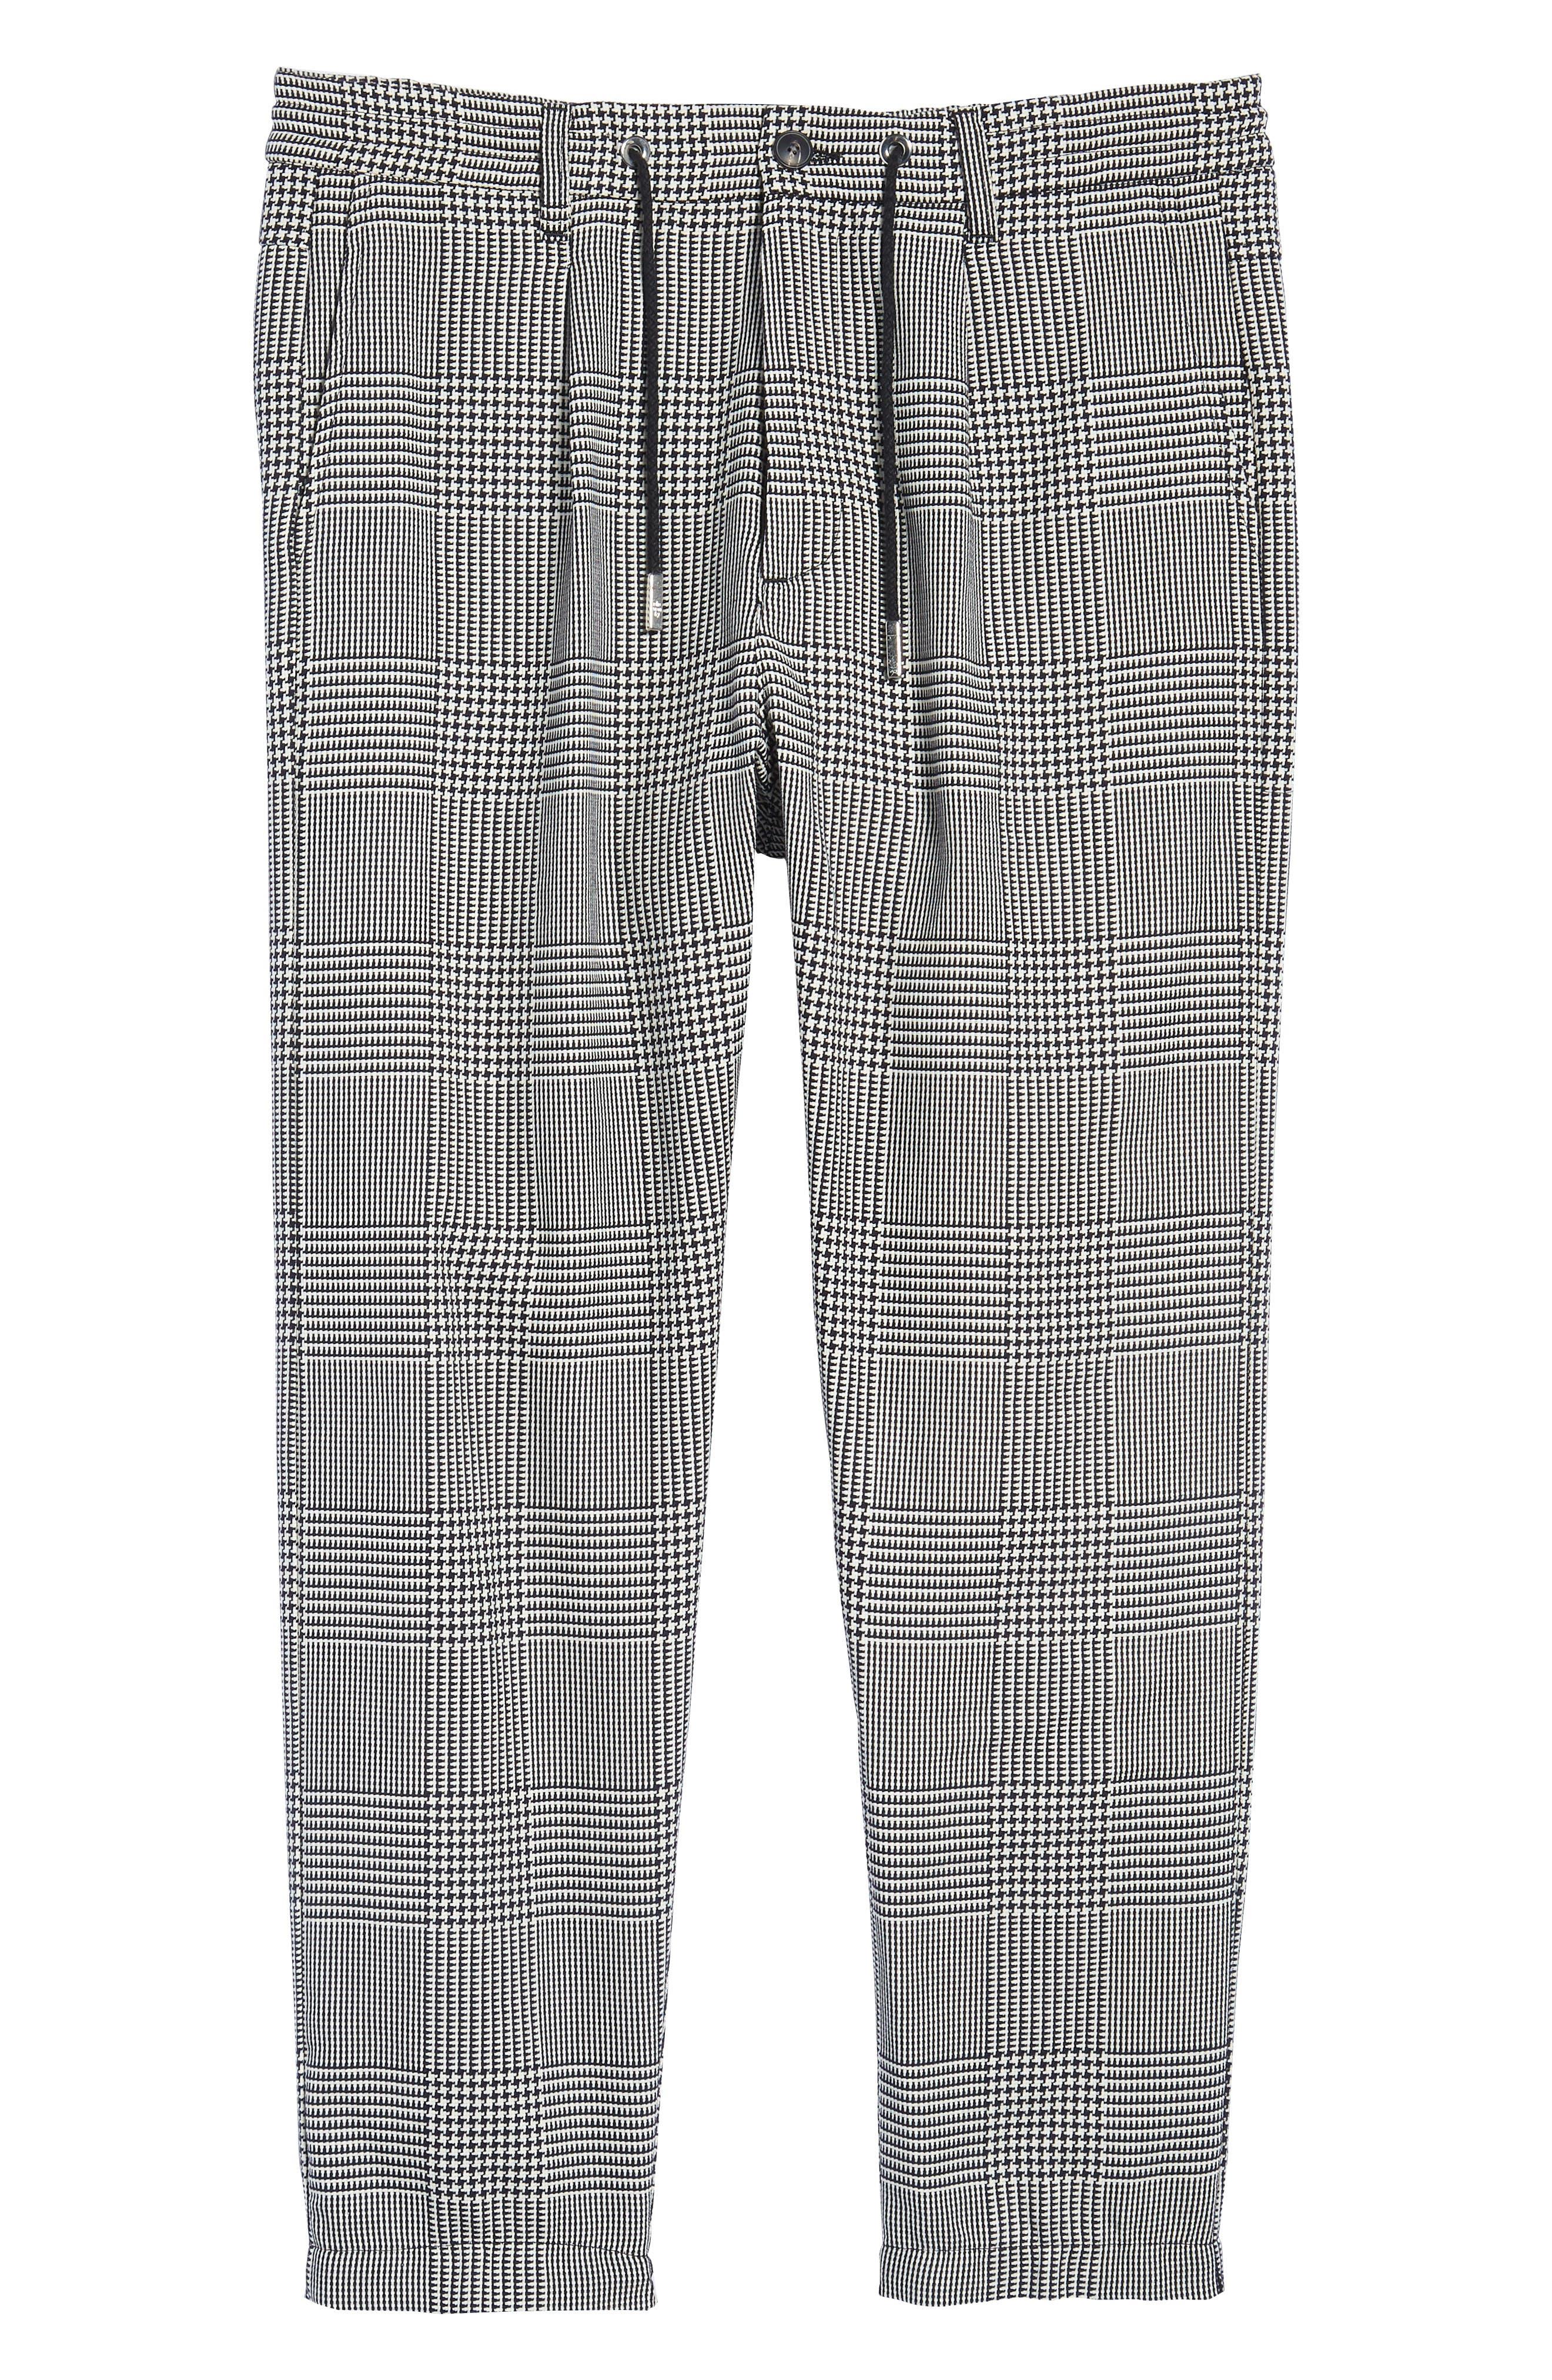 Prince of Wales Check Jogger Pants,                             Alternate thumbnail 6, color,                             Blk/White